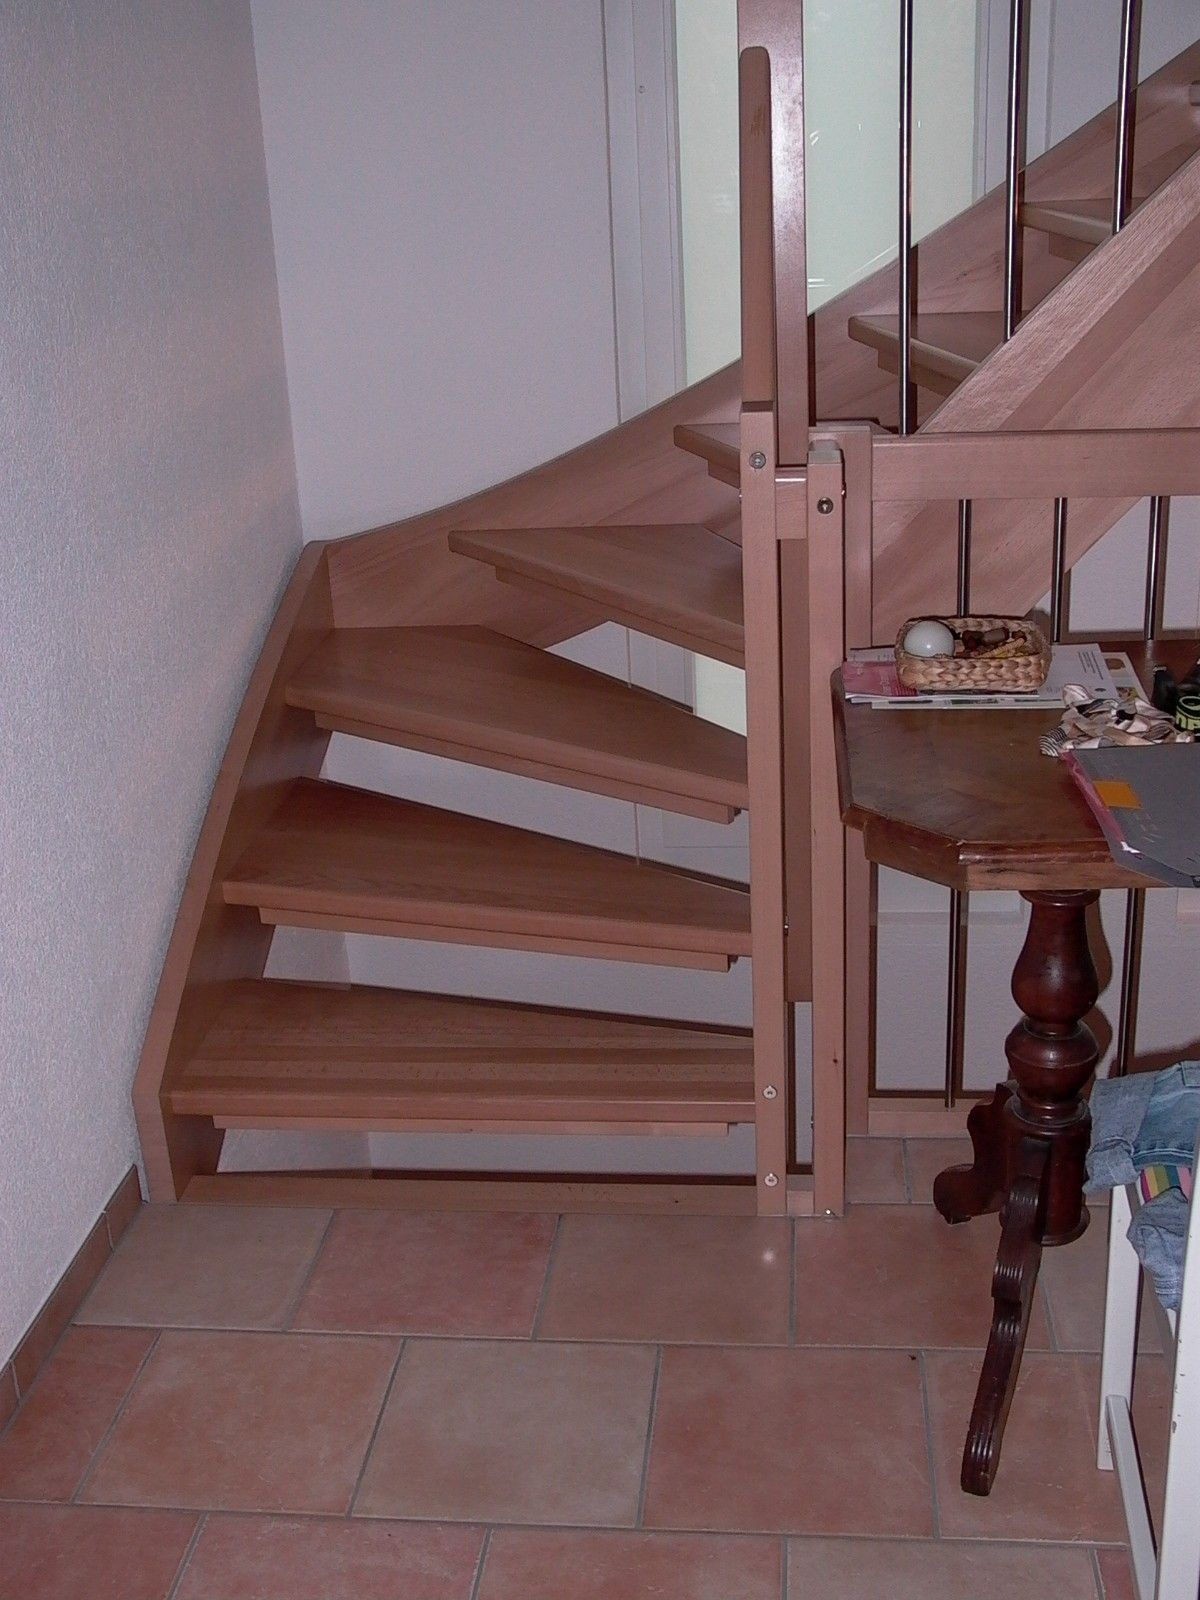 Stair Image 67